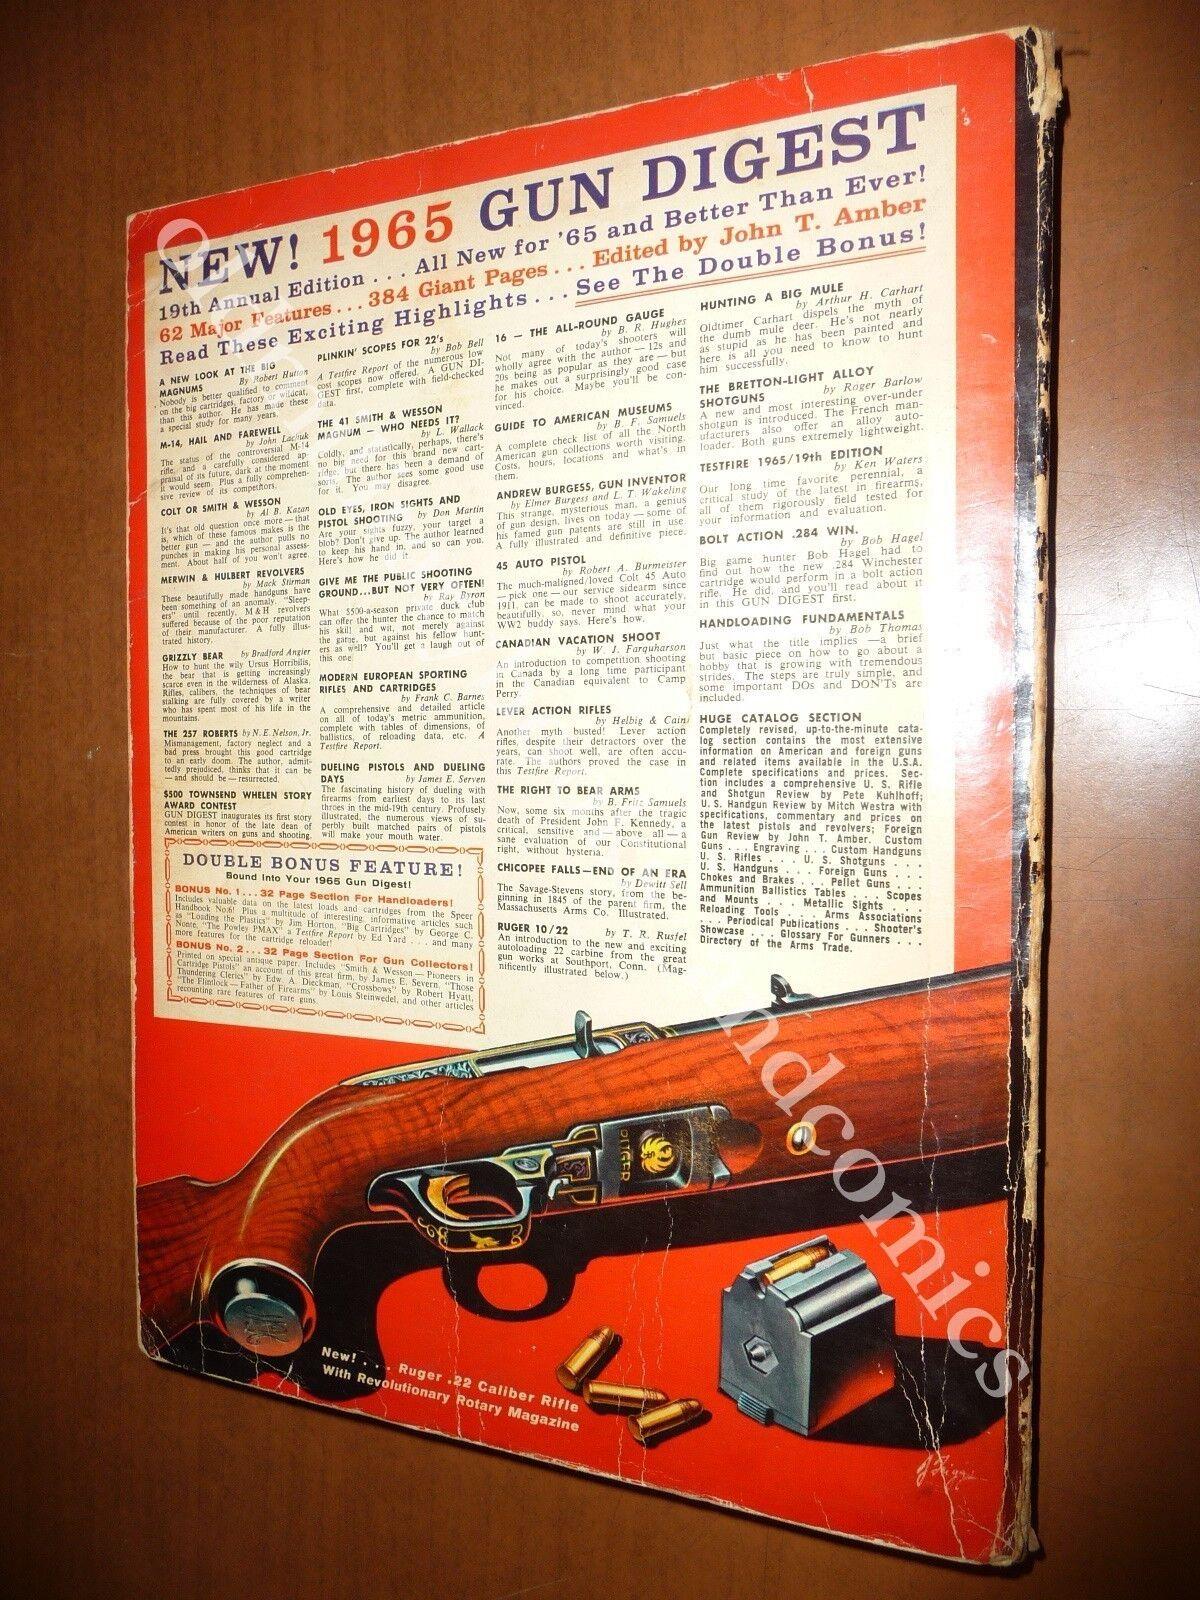 GUN DIGEST 1965 WORLD'S GREATEST GUN BOOK JOHN T. AMBER PISTOLE FUCILI REVOLVER